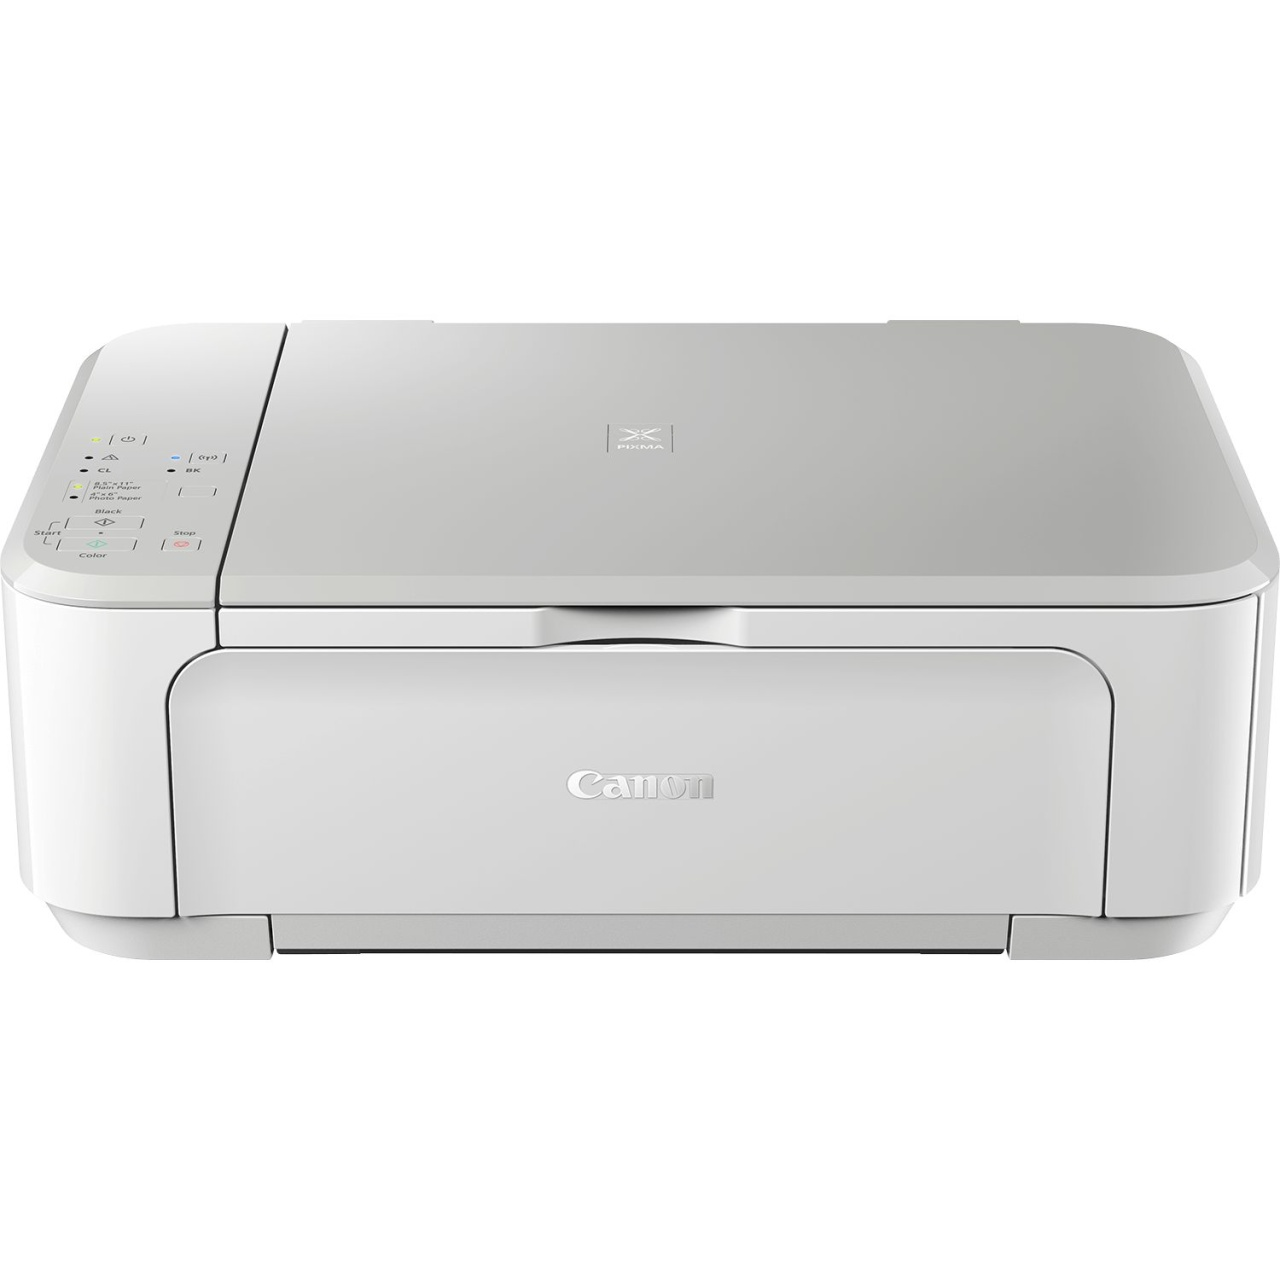 Canon PIXMA MG3650S Tinten-Multifunktionsdrucker, weiß